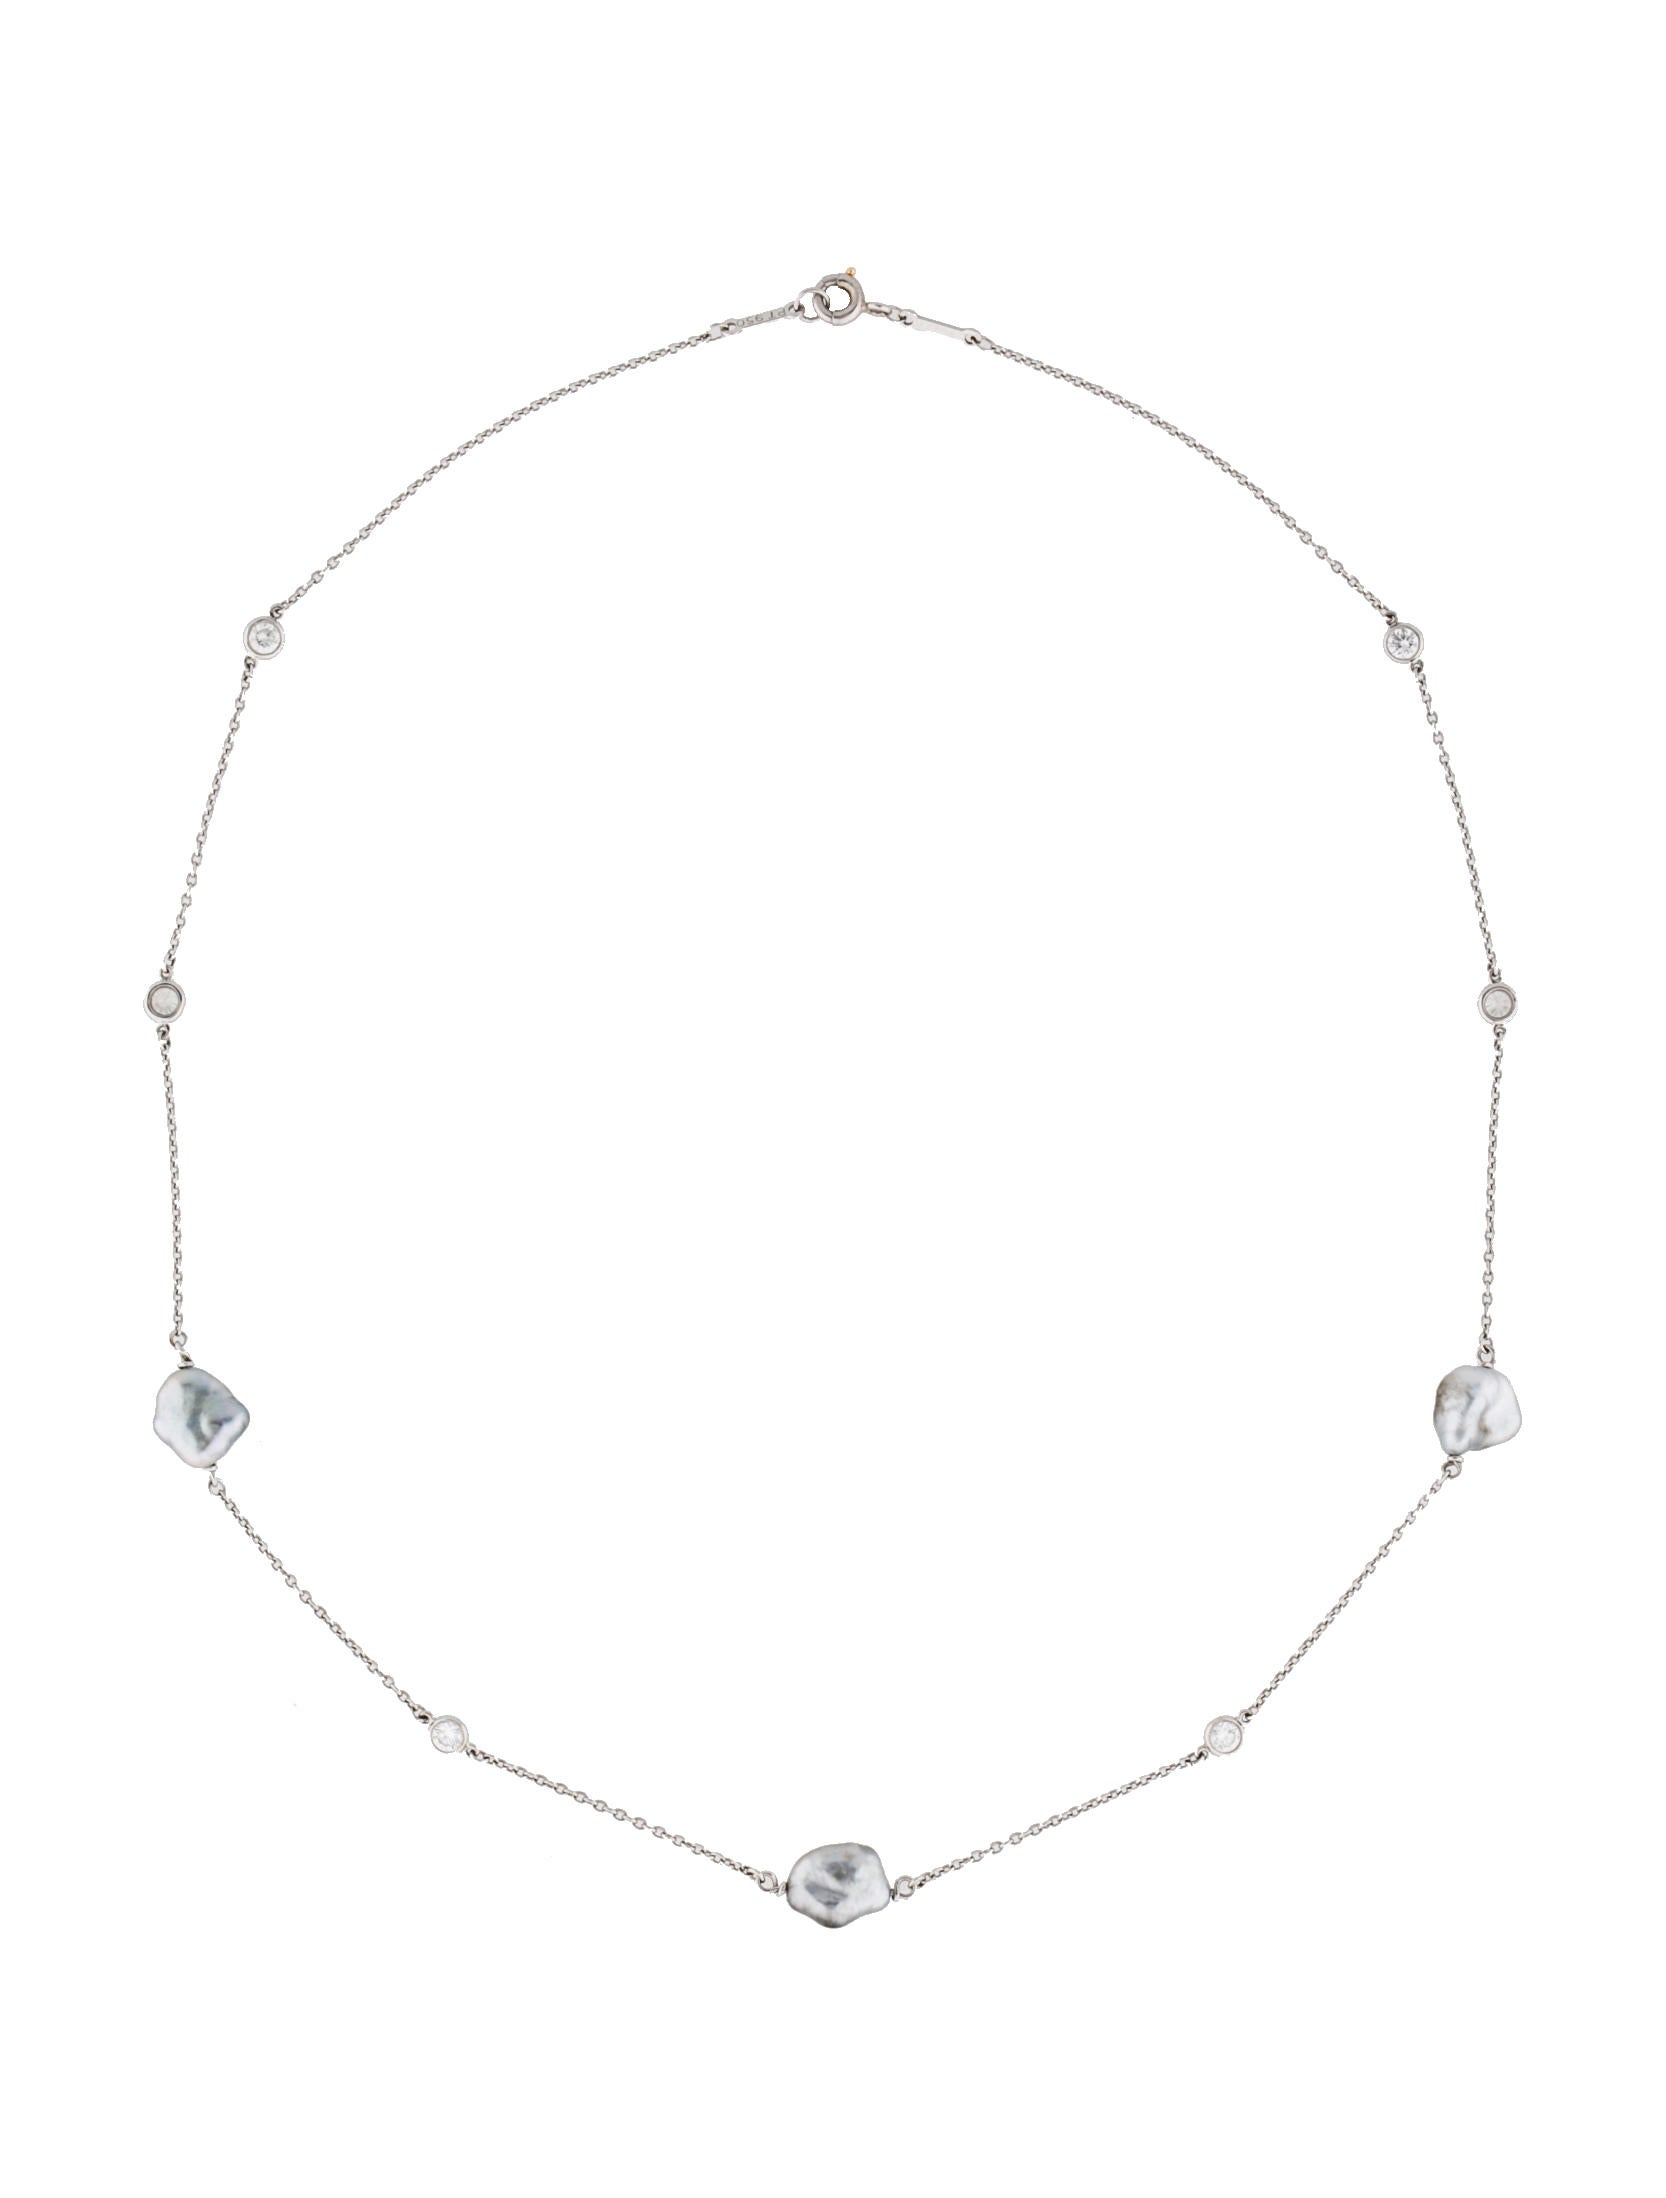 Tiffany co diamonds by the yard sprinkle necklace for Diamonds by the yard ring